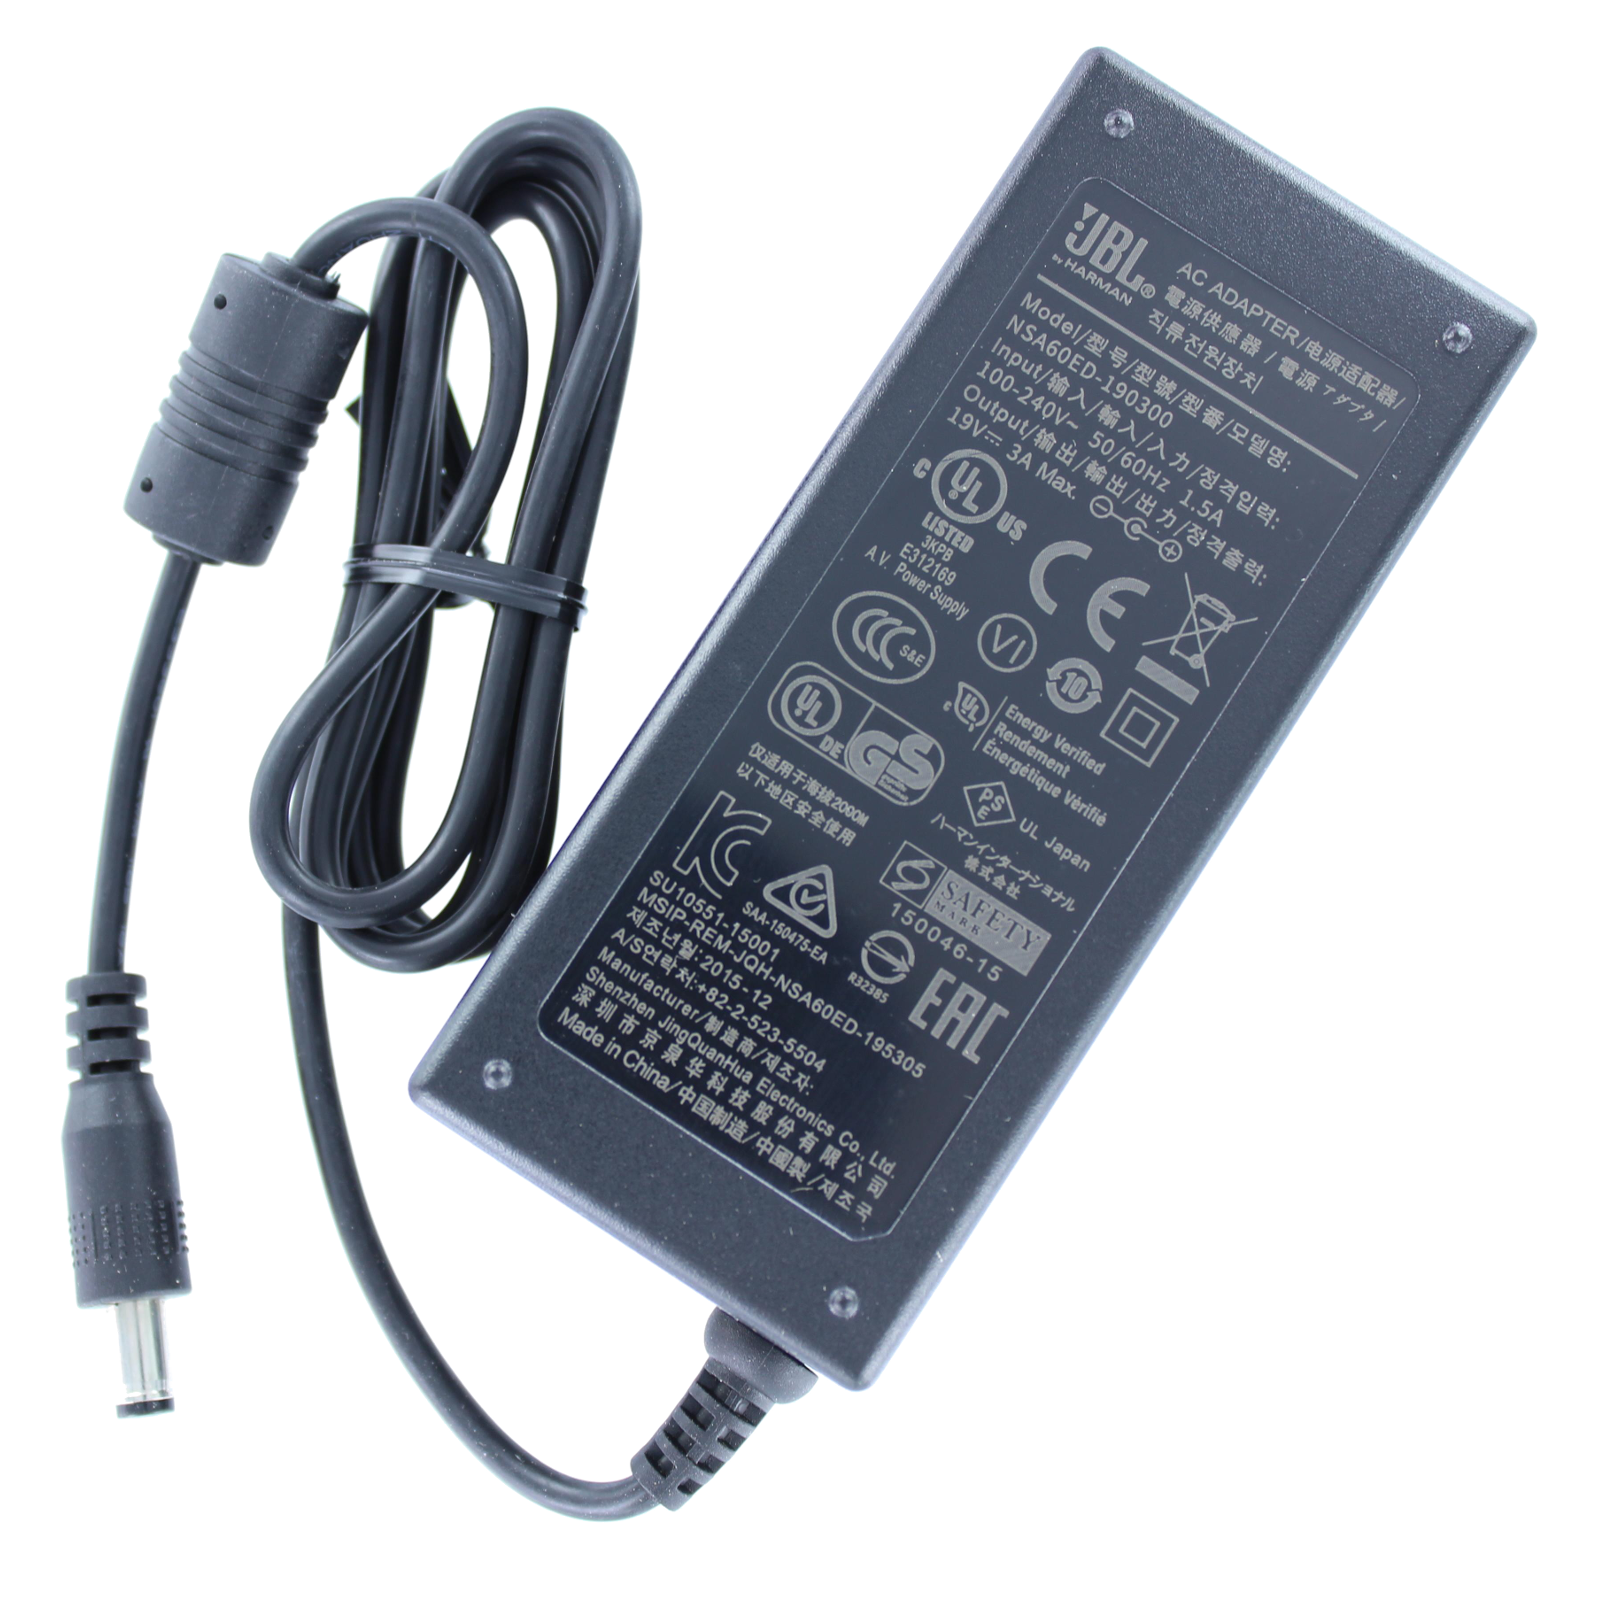 Power Adapter Jbl Xtreme Emea